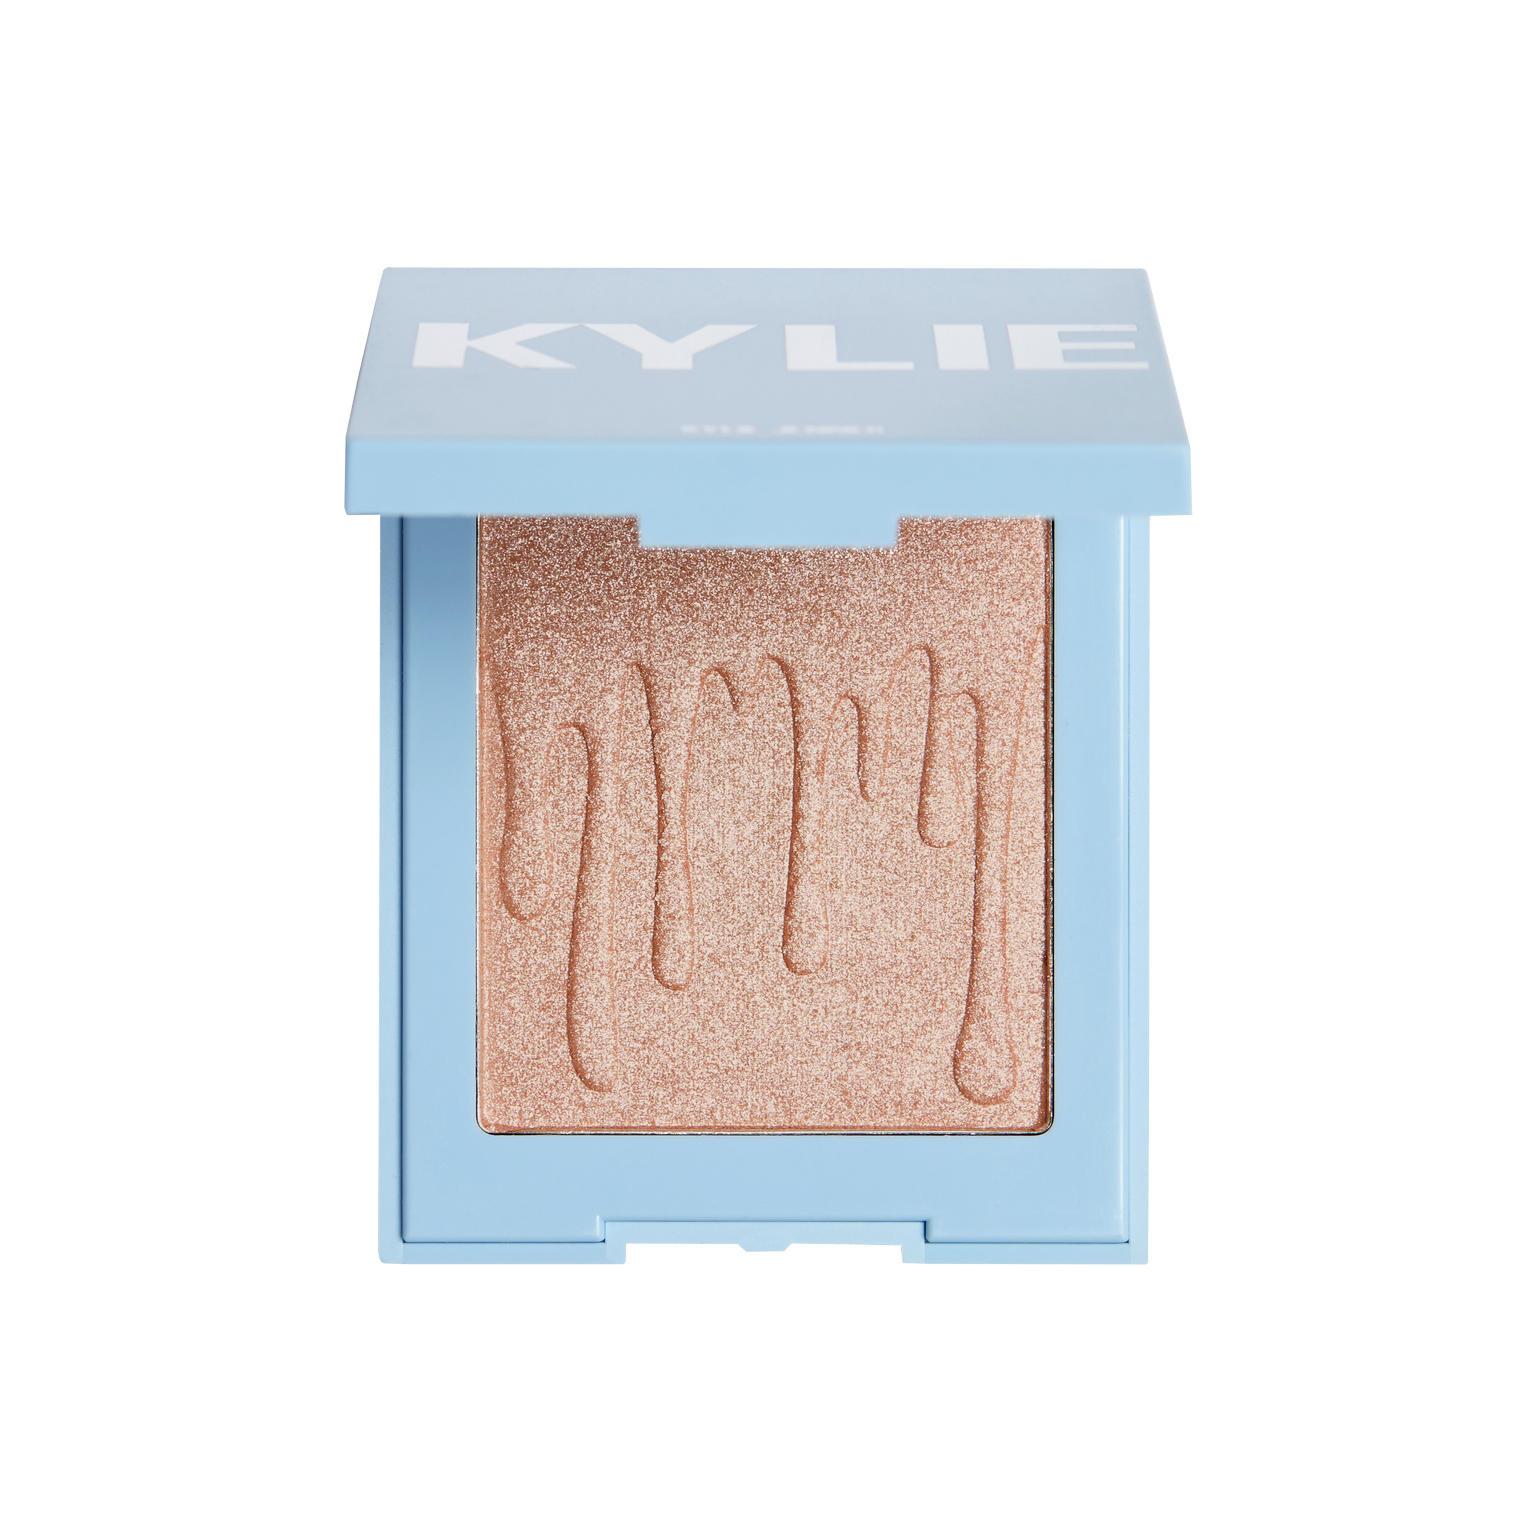 Kylie Cosmetics Pressed Illuminating Powder Snow Angel